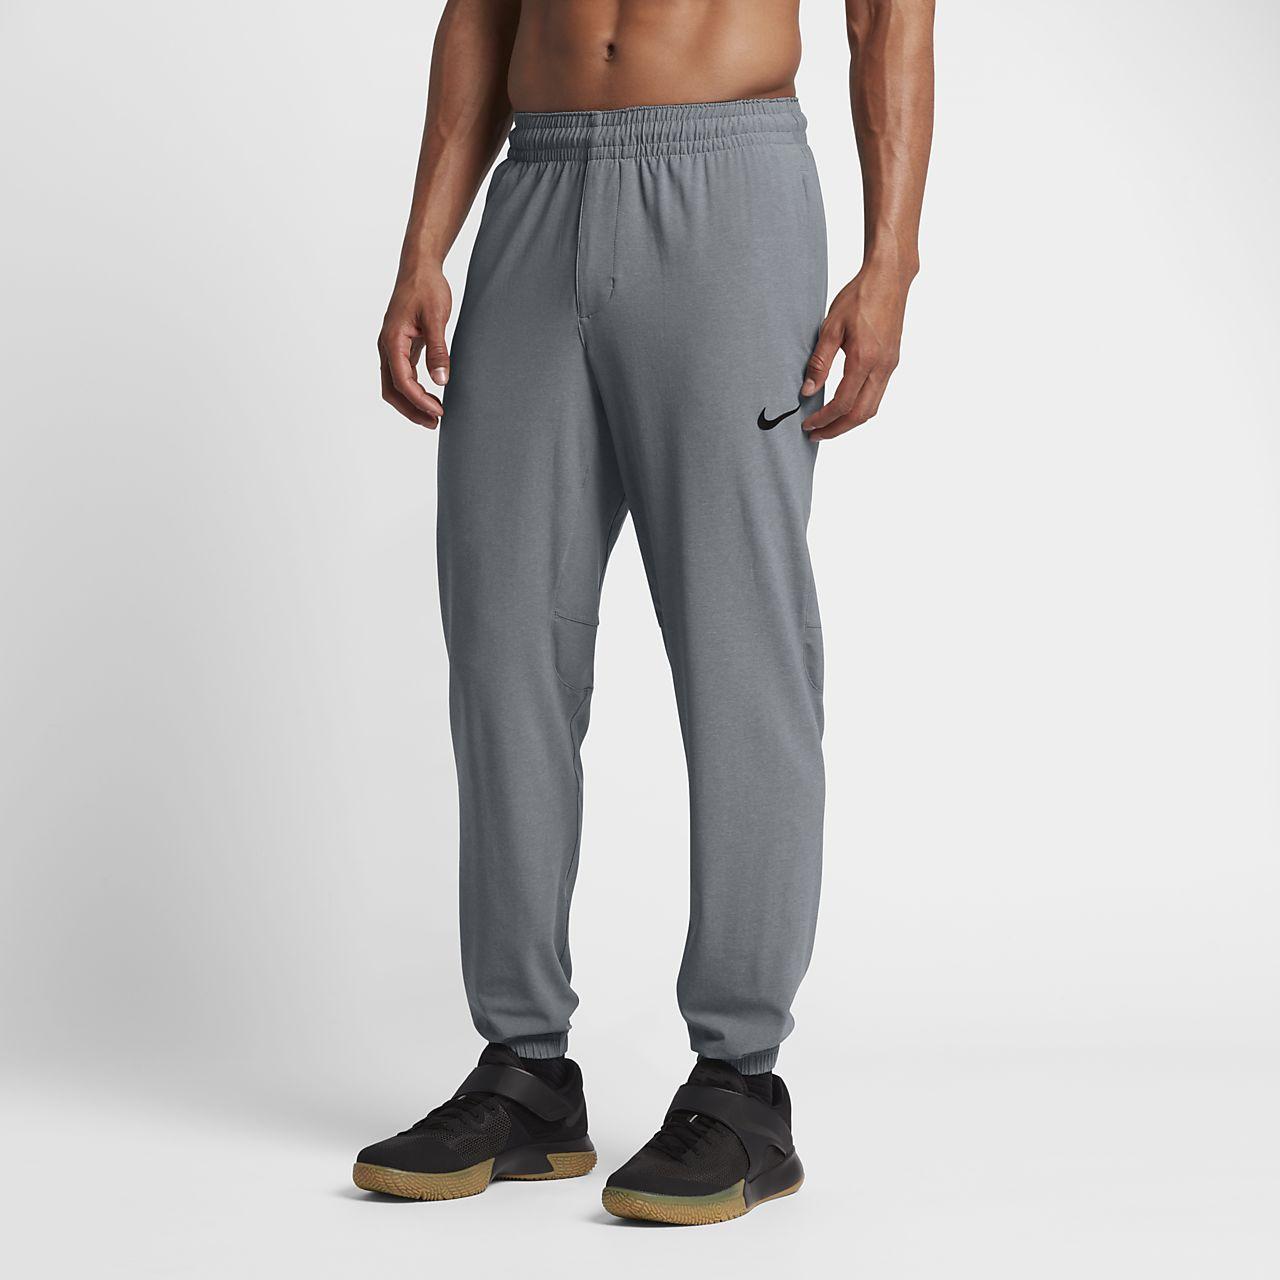 ... Nike Flex Men's Basketball Pants